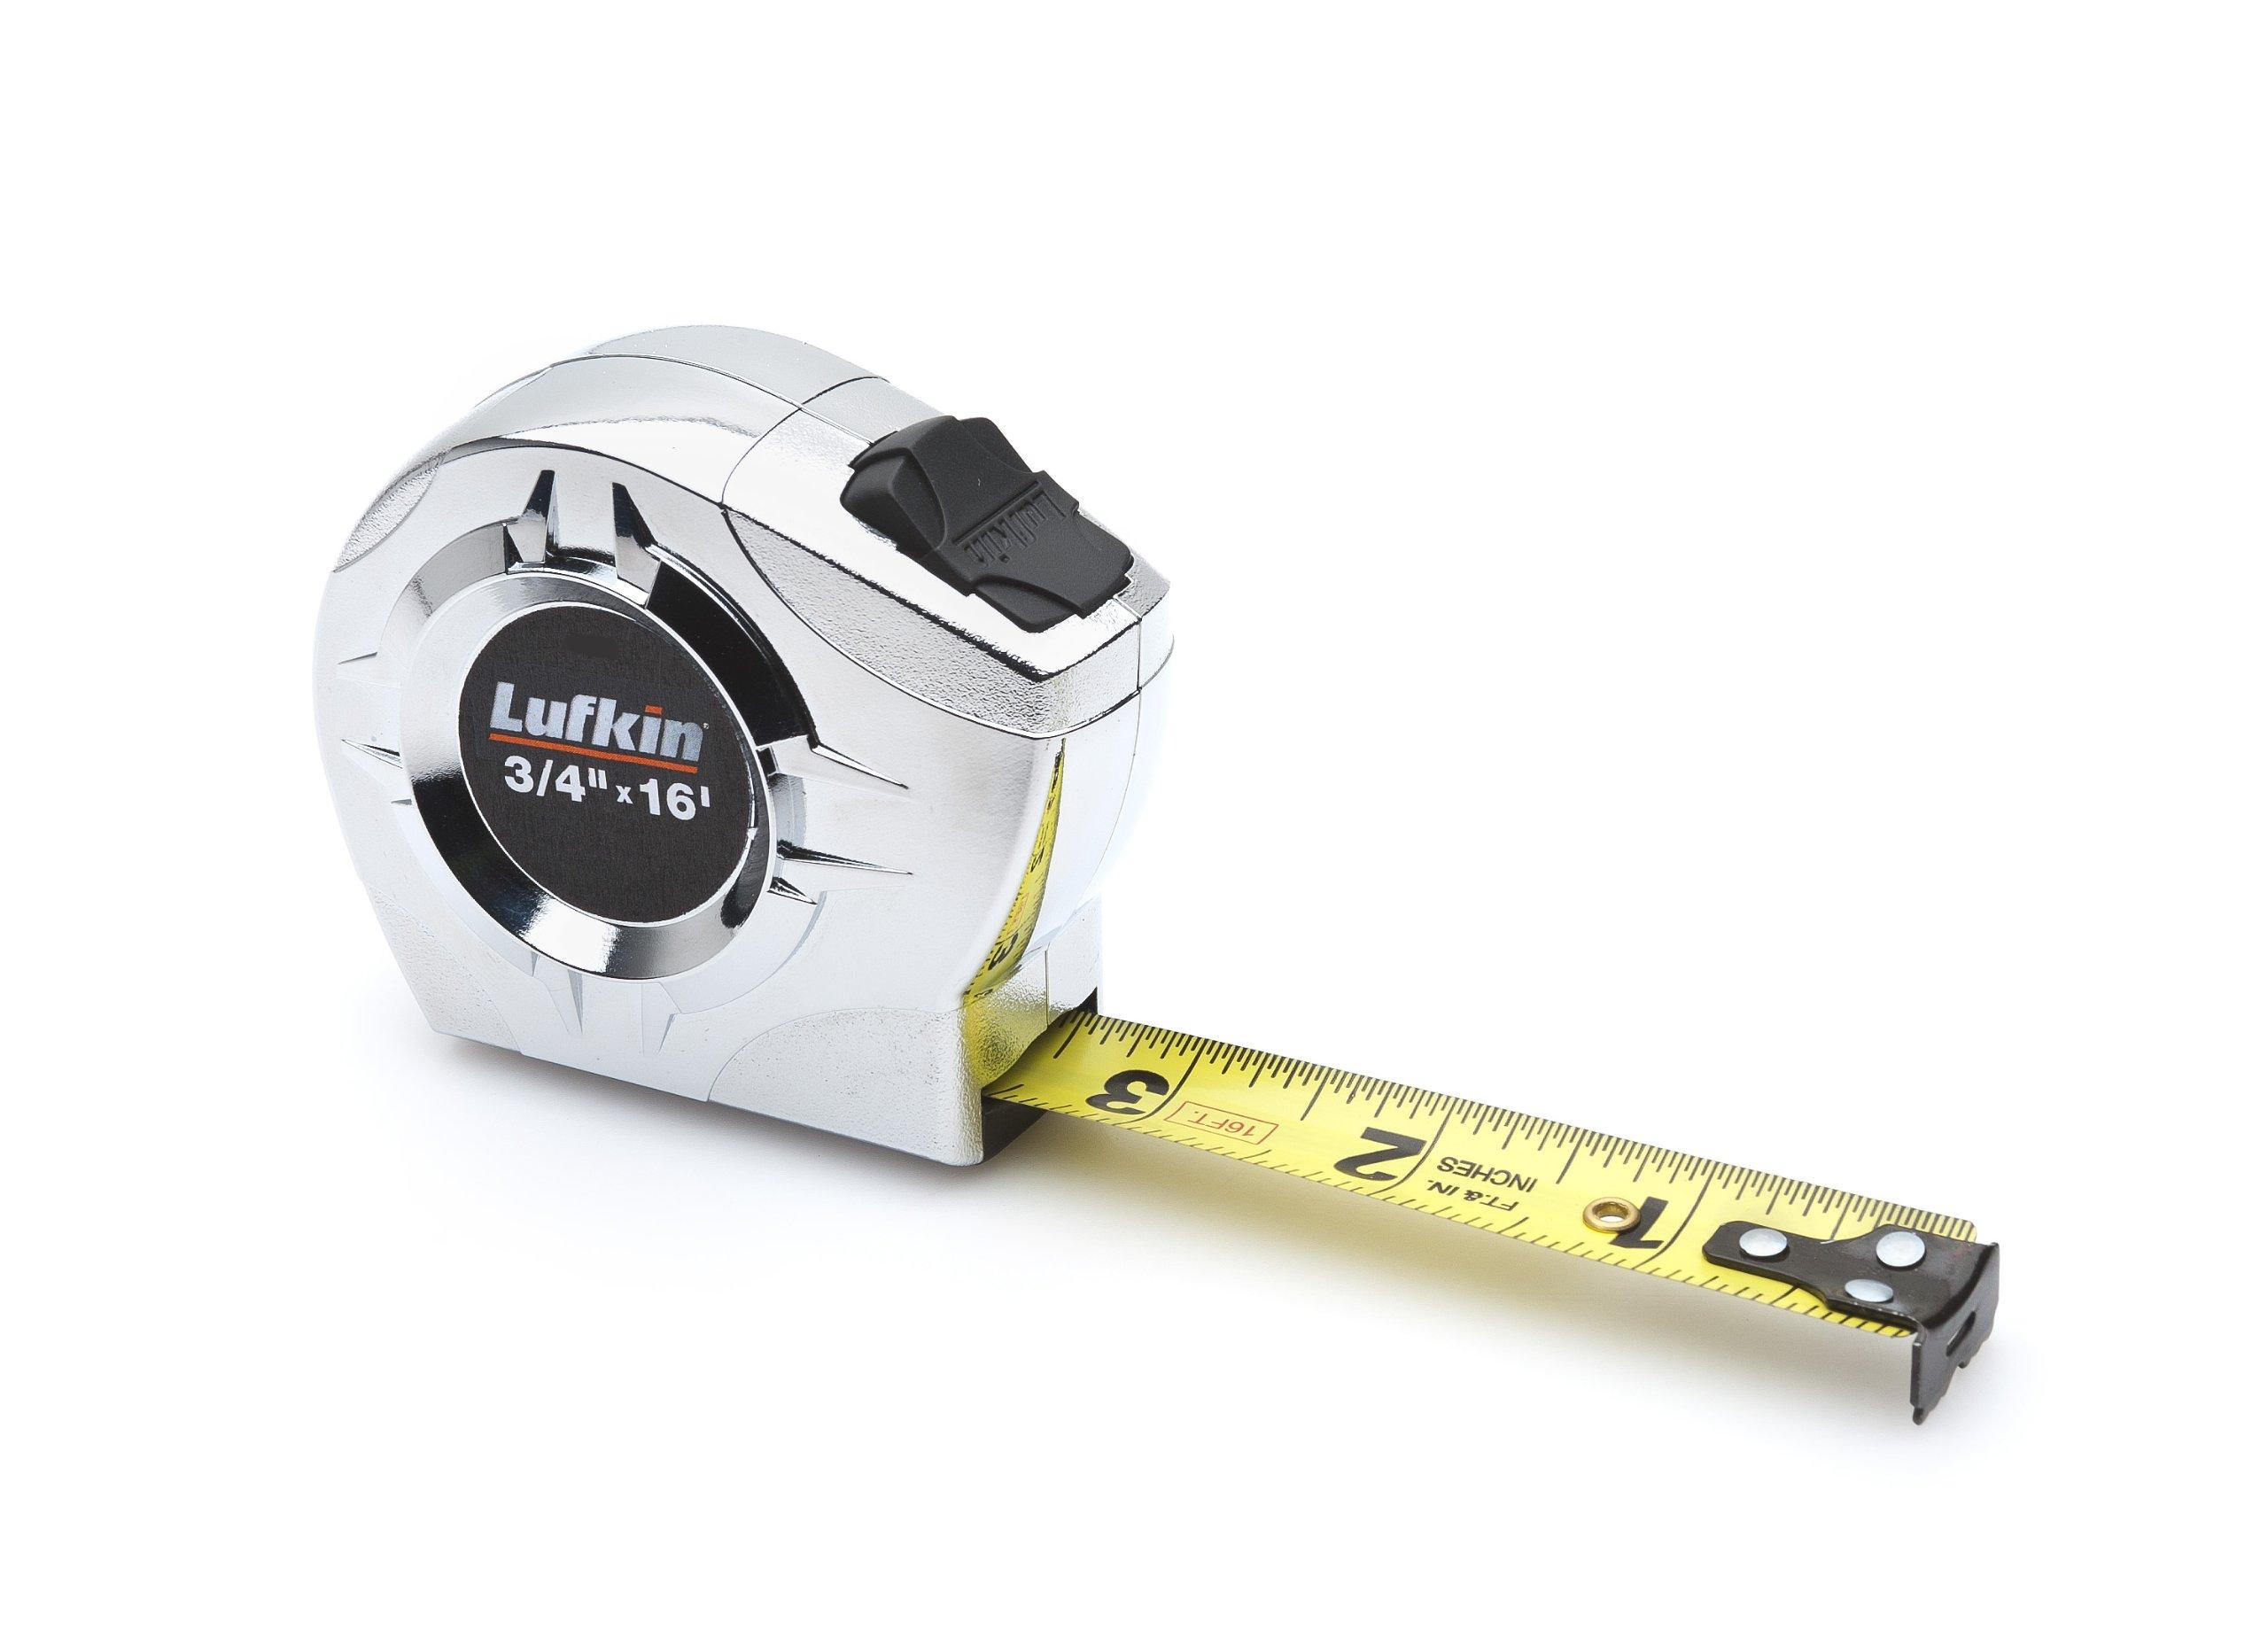 Lufkin P2316 Power Return Tape, 3/4-Inch by 16-Feet, Chrome